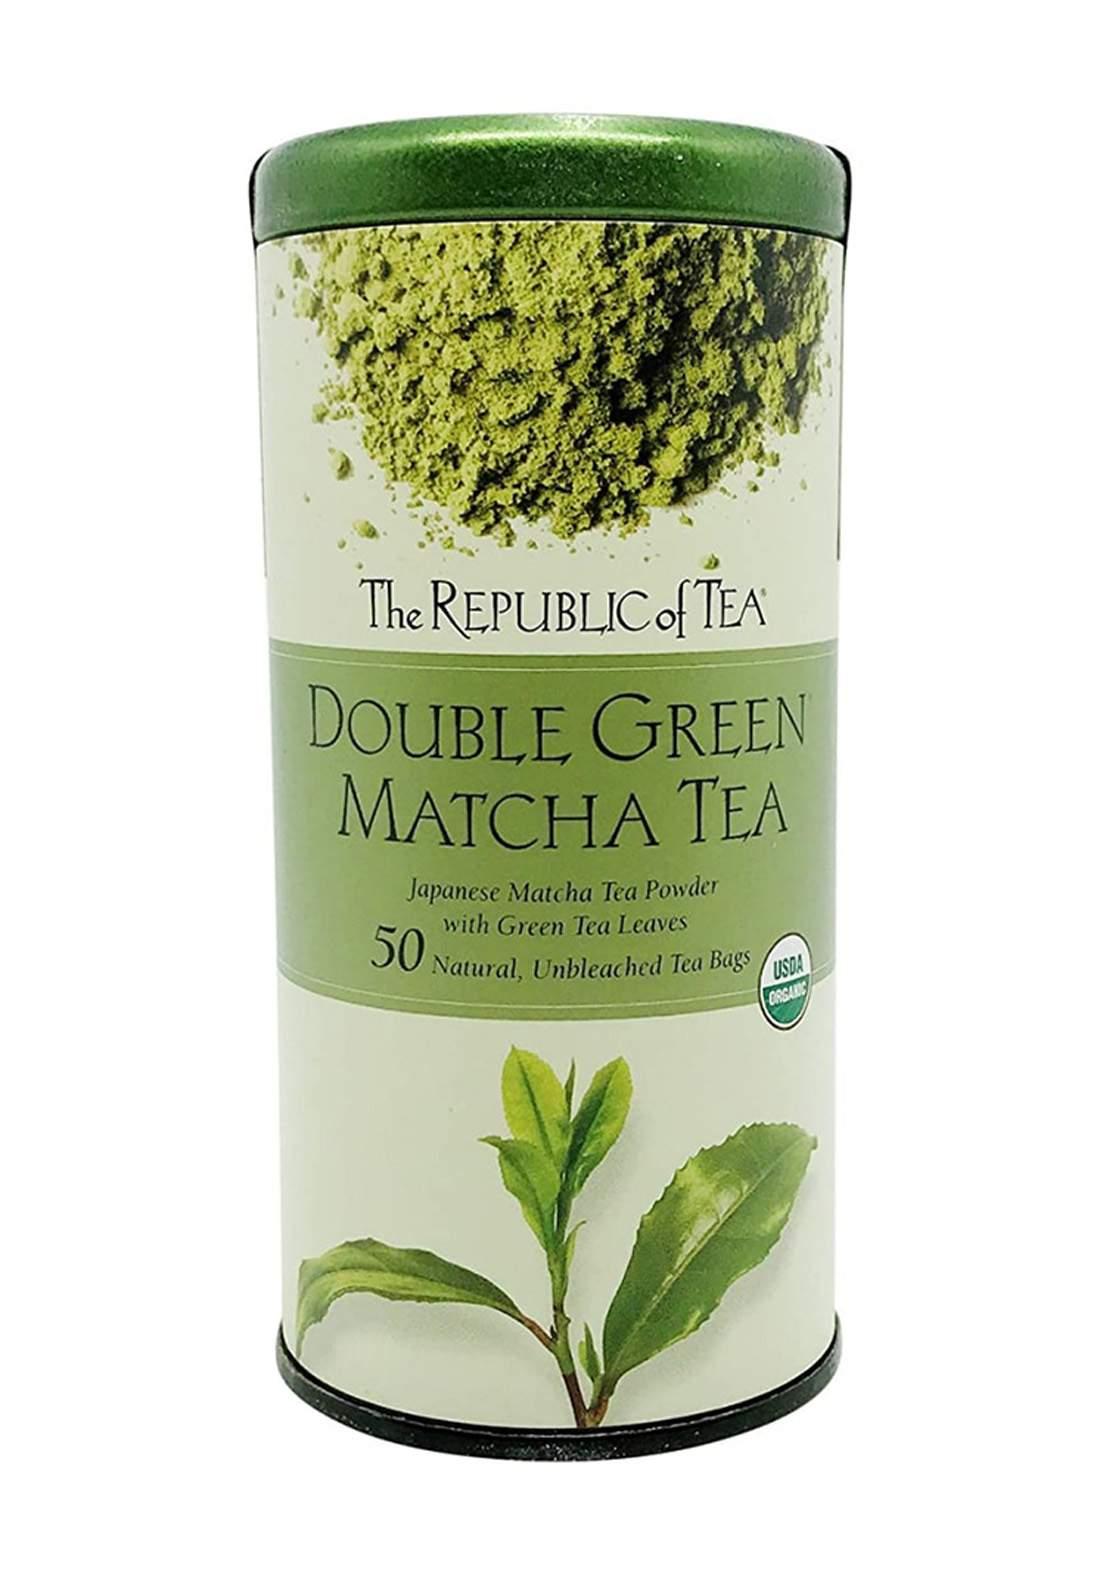 The Republic Of Tea Bouble Green Match Tea 50 Tea Bags شاي الماتشا والشاي الأخضر